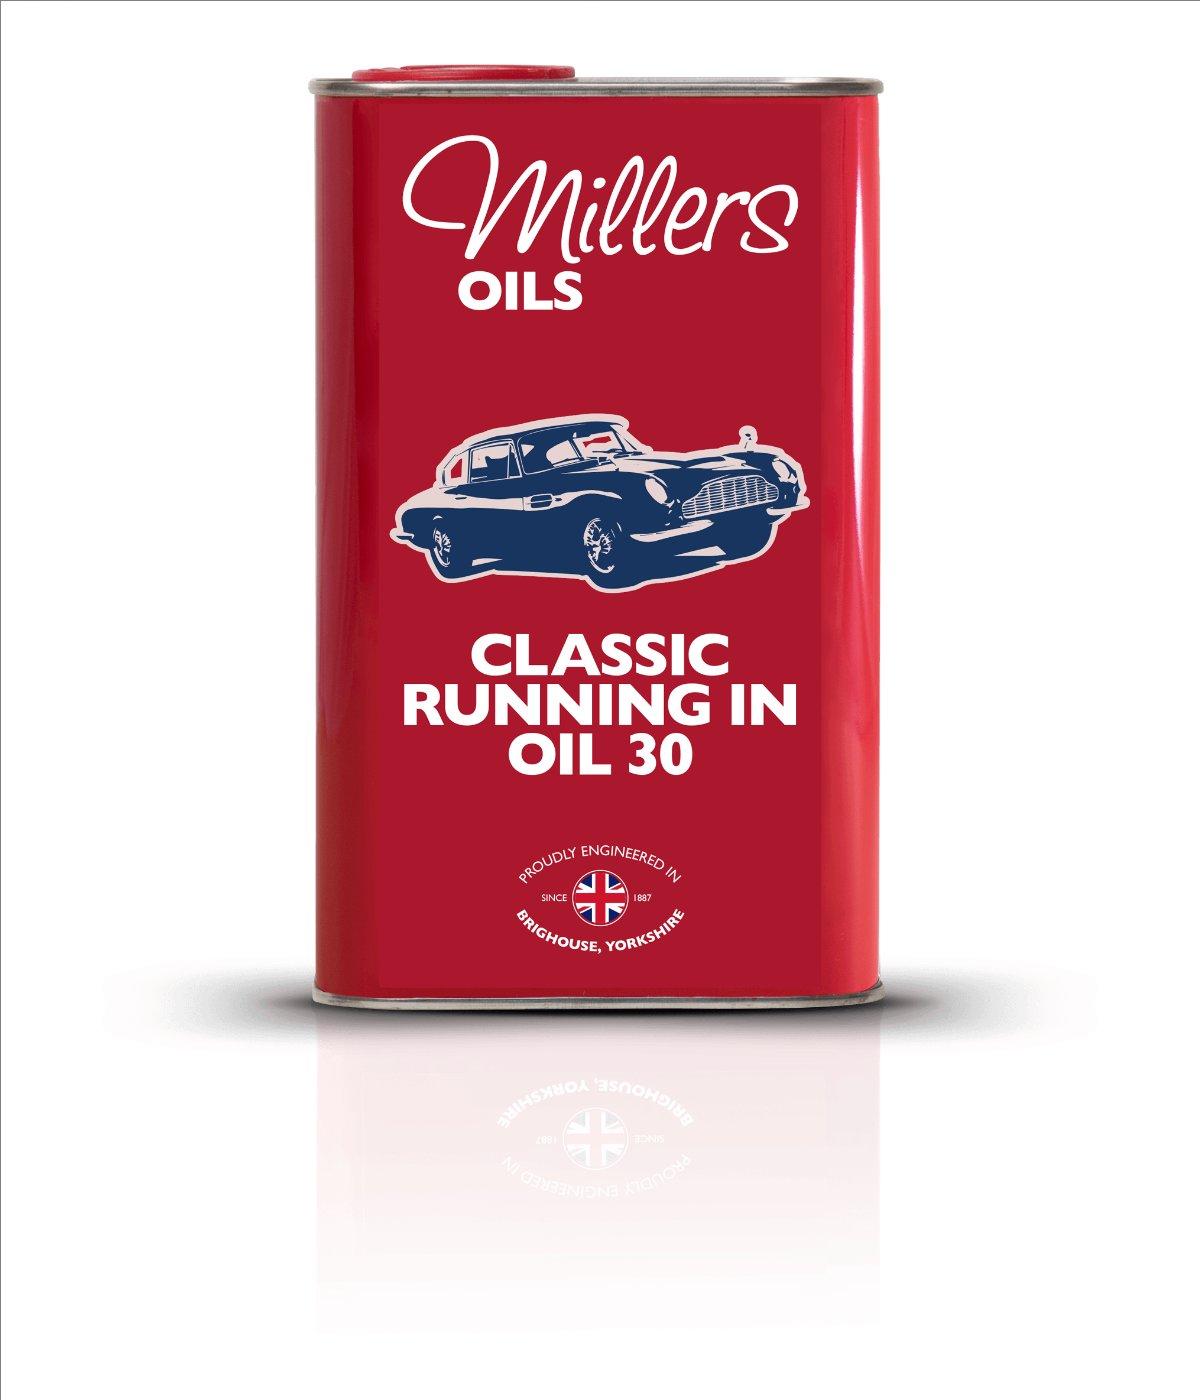 Classic Running in oil 30